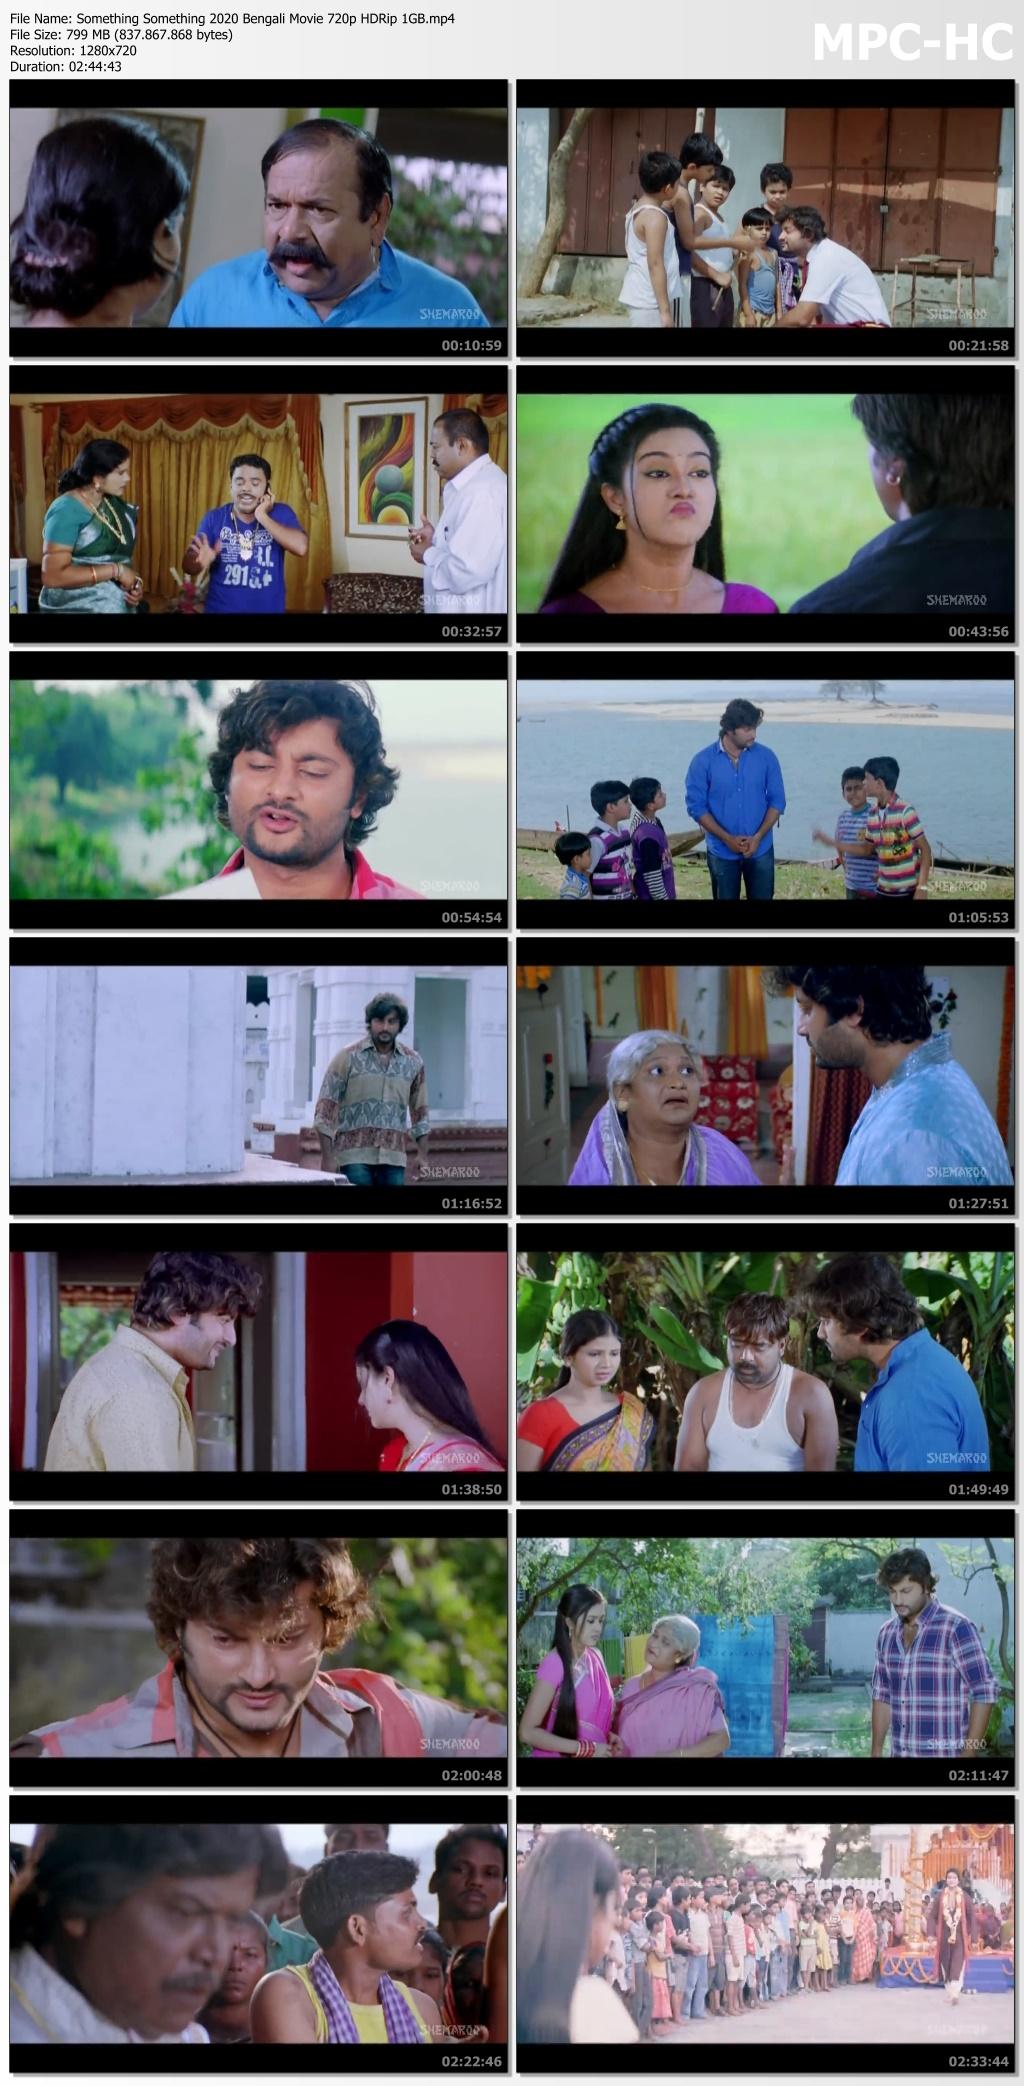 Something-Something-2020-Bengali-Movie-720p-HDRip-1-GB-mp4-thumbs